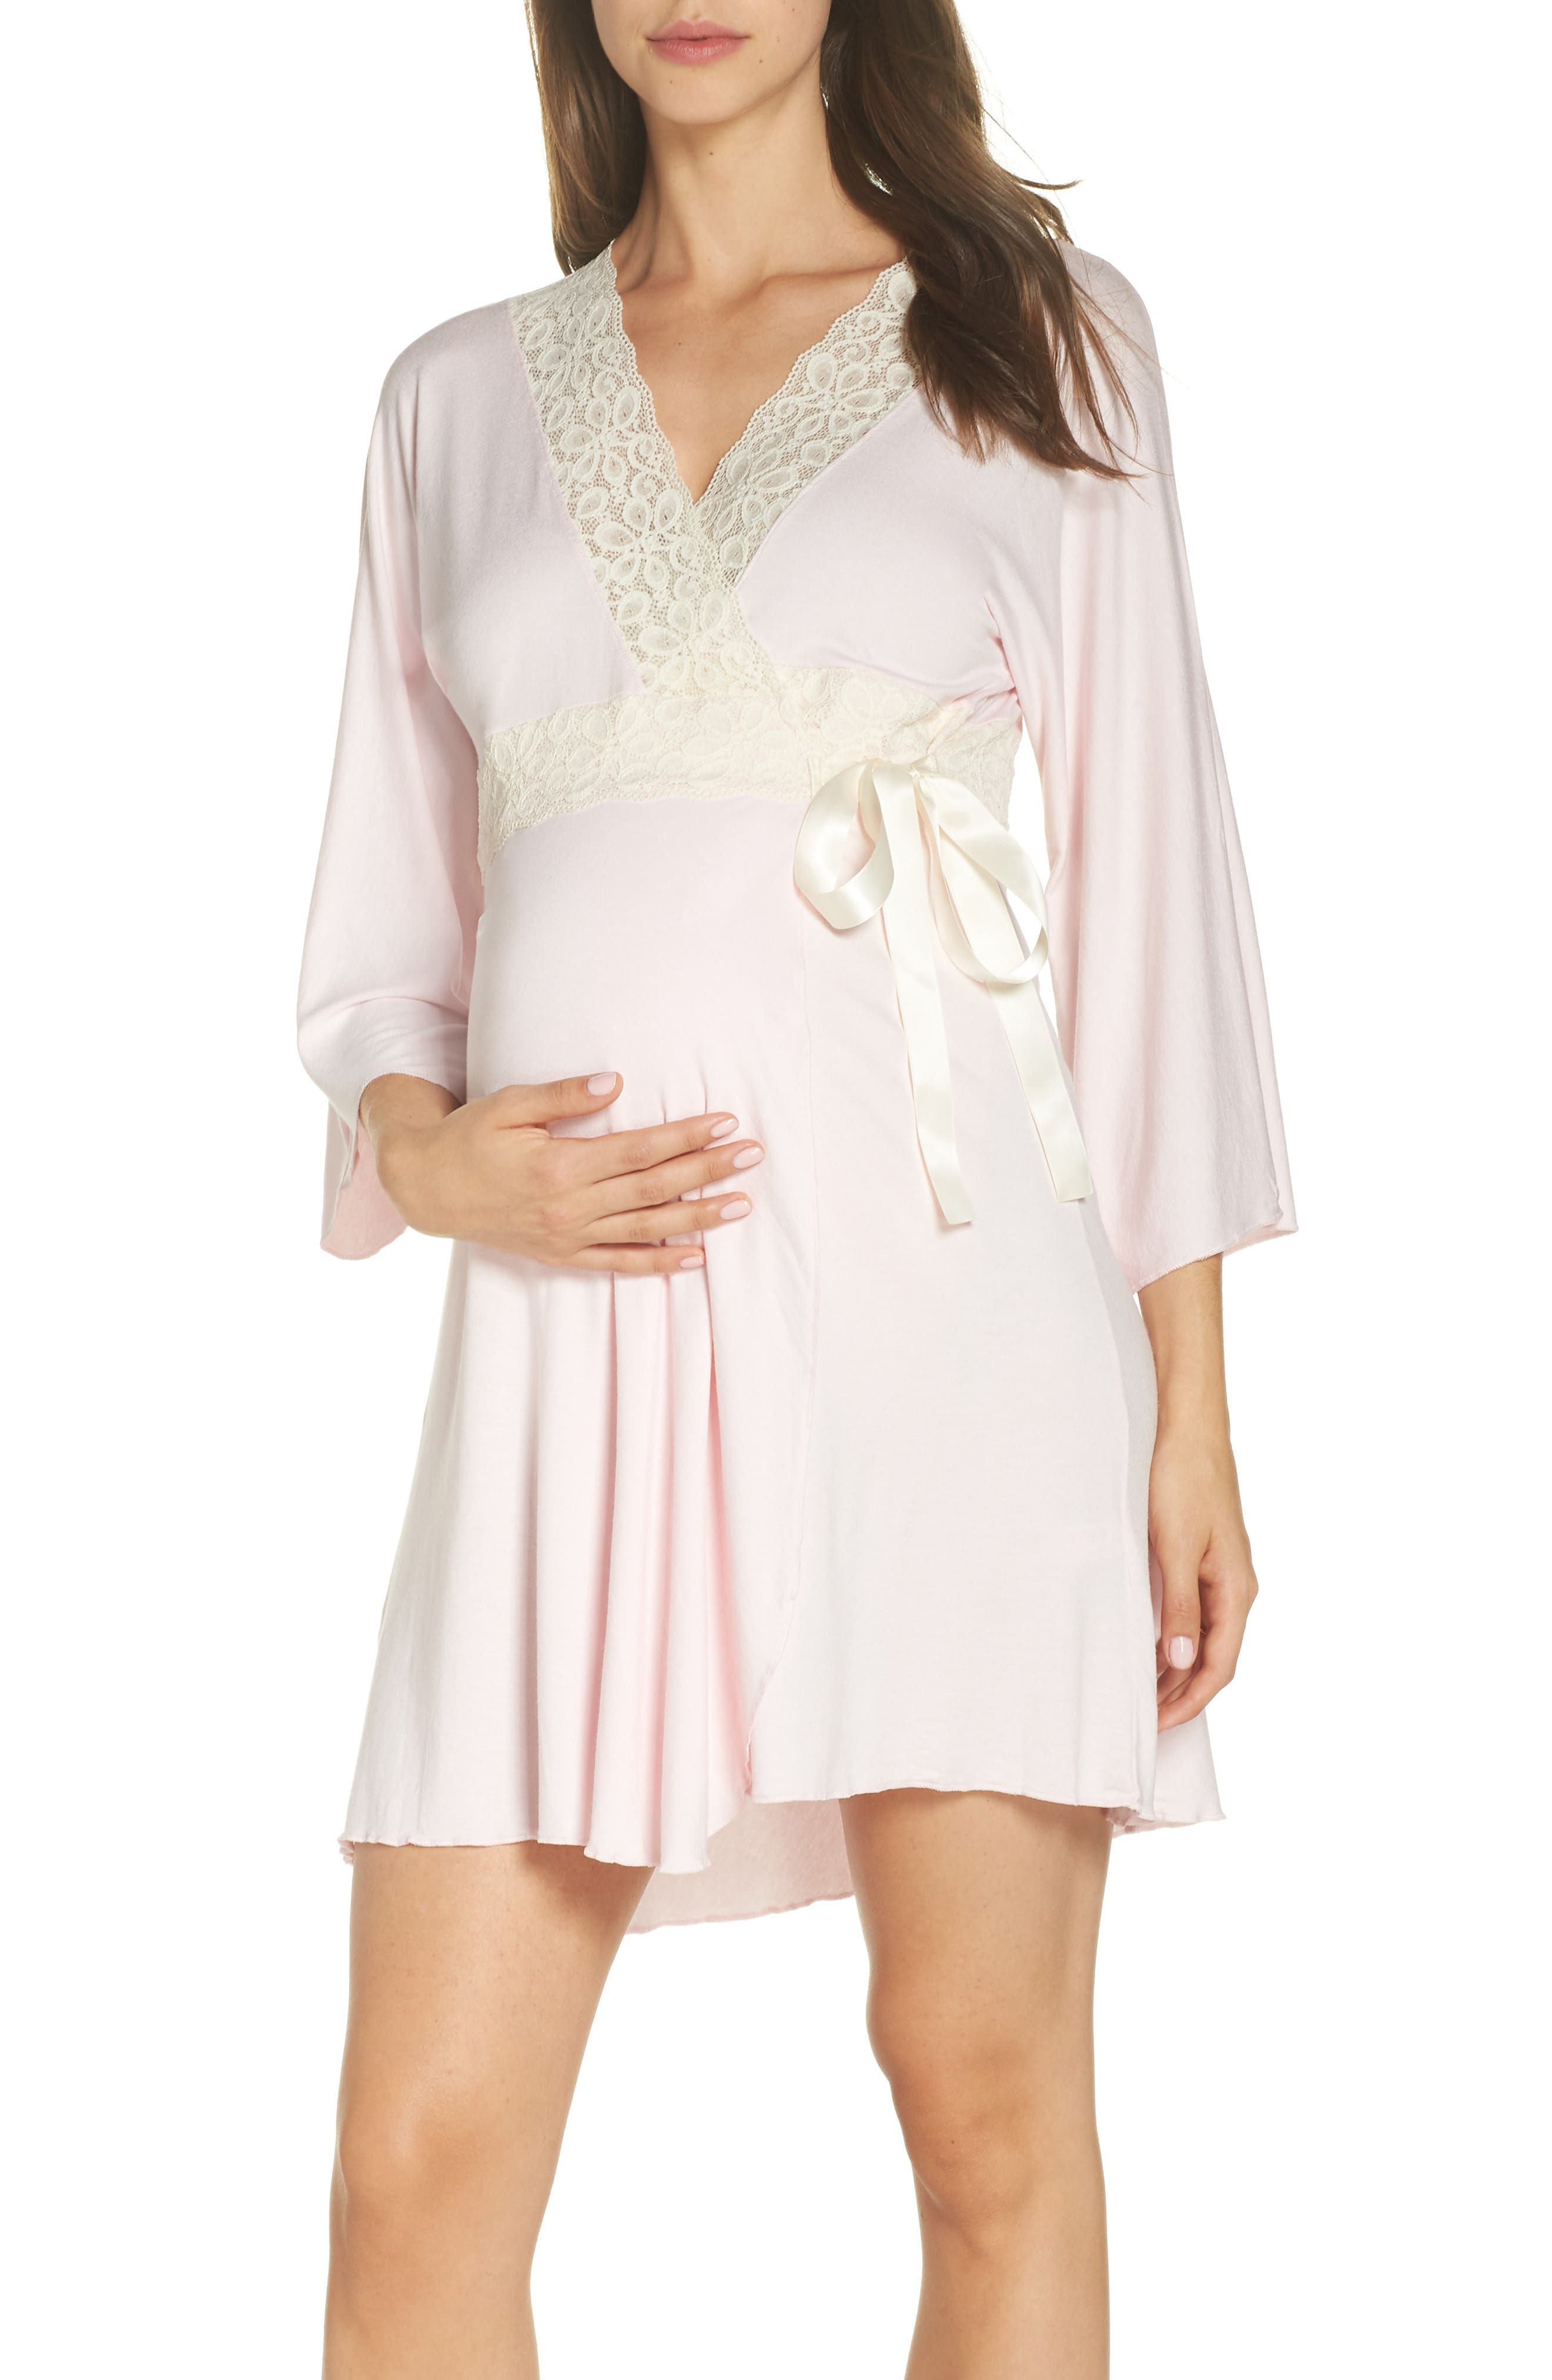 Lace Trim Maternity/Nursing Robe,                             Main thumbnail 1, color,                             PINK/ PEARL